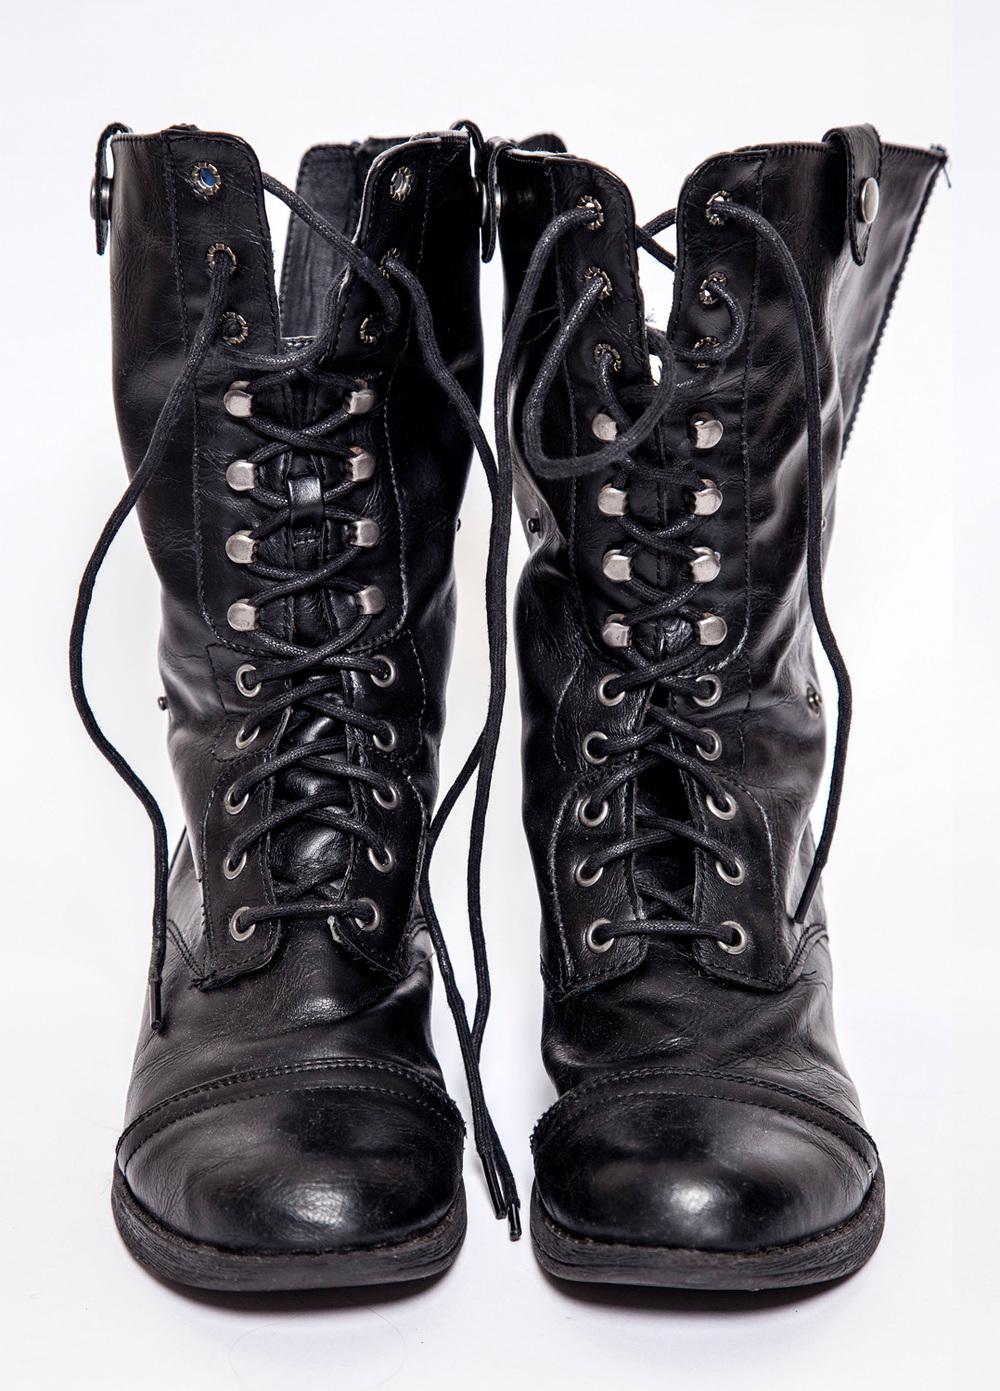 1500px300DPI_Boots.jpg